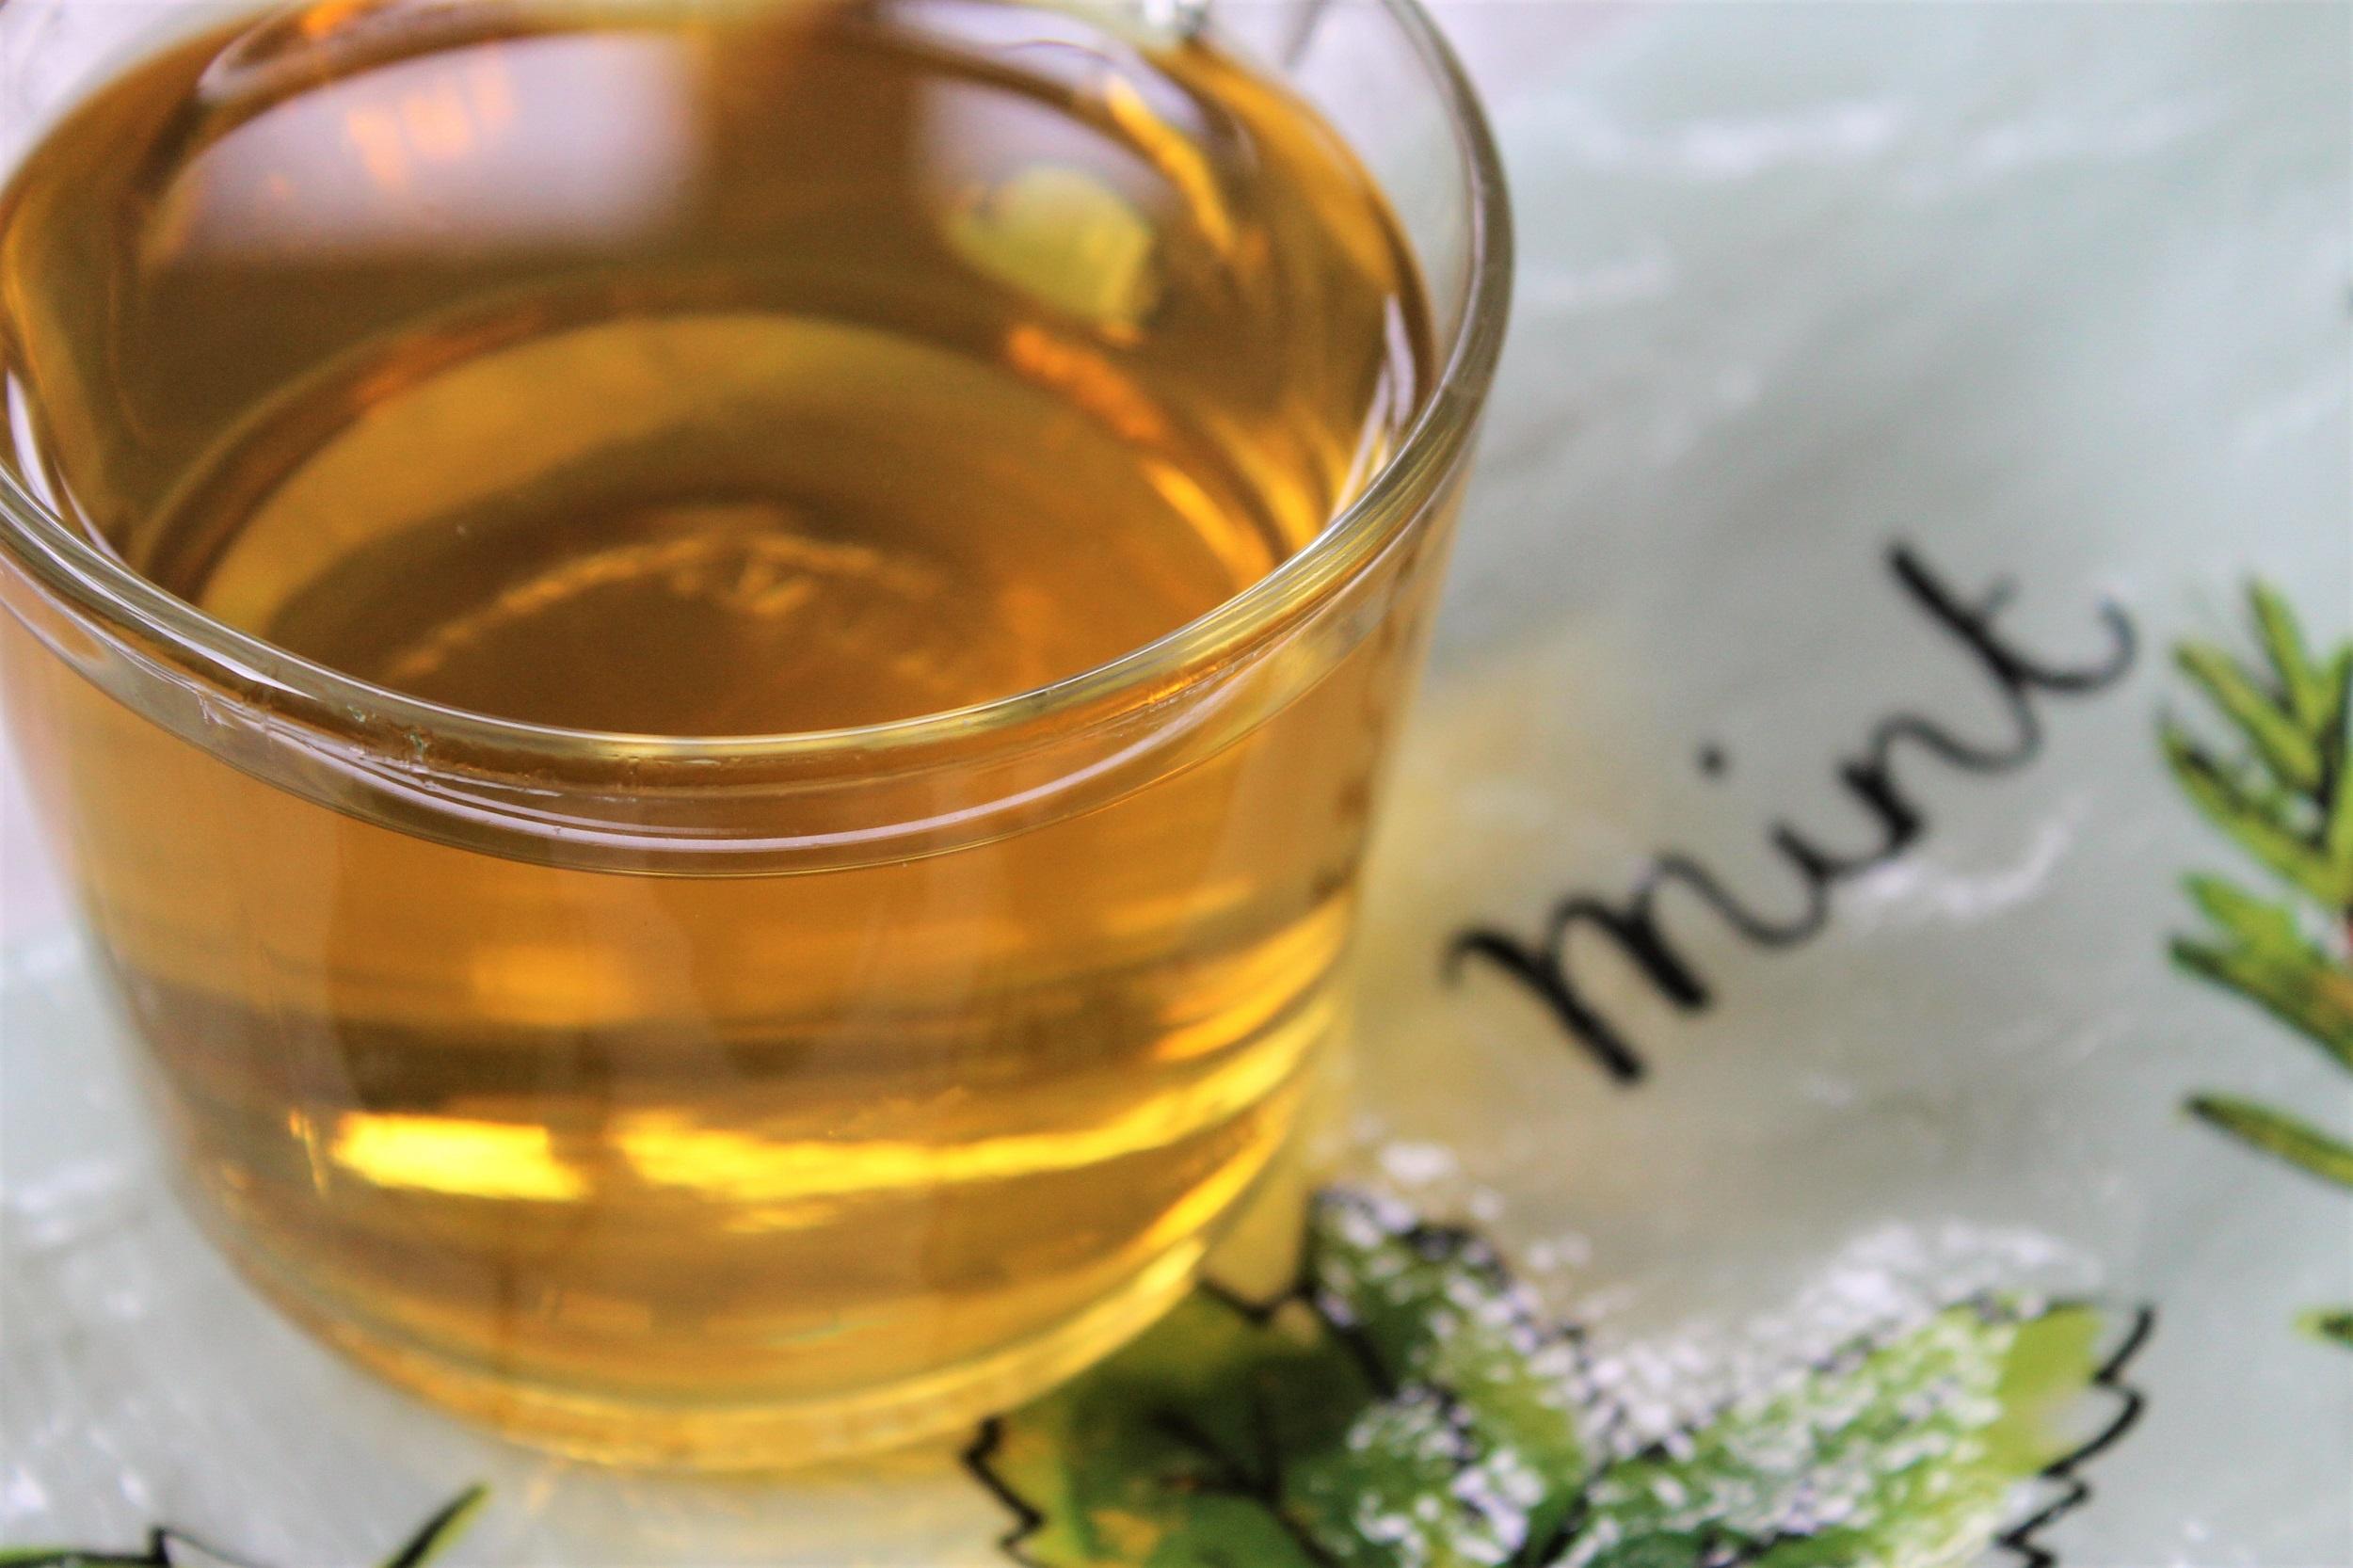 bion spearmint tisane in glass teacup